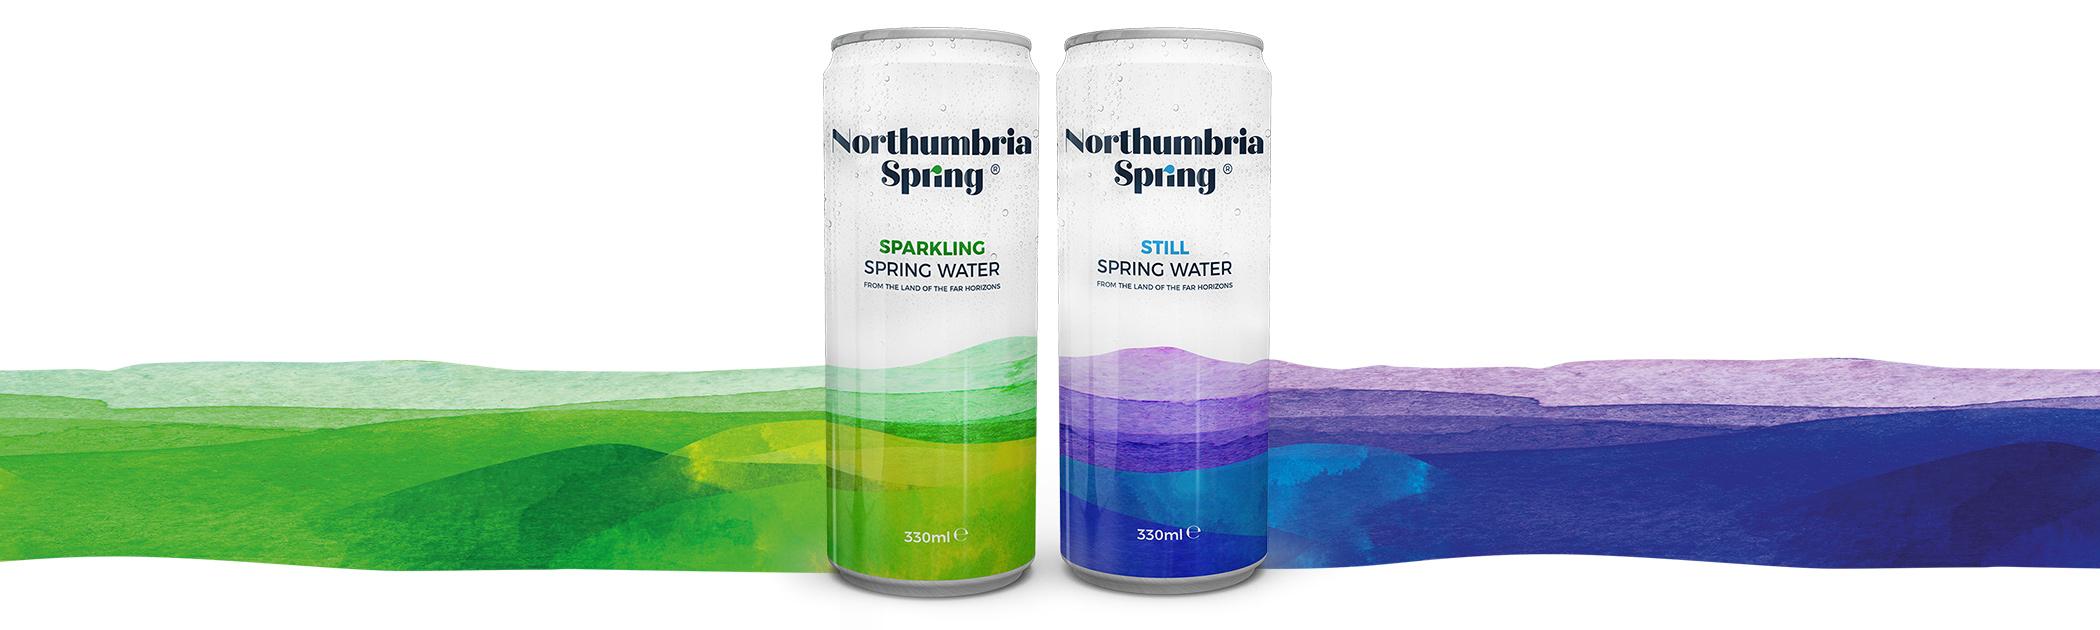 Northumbria Spring